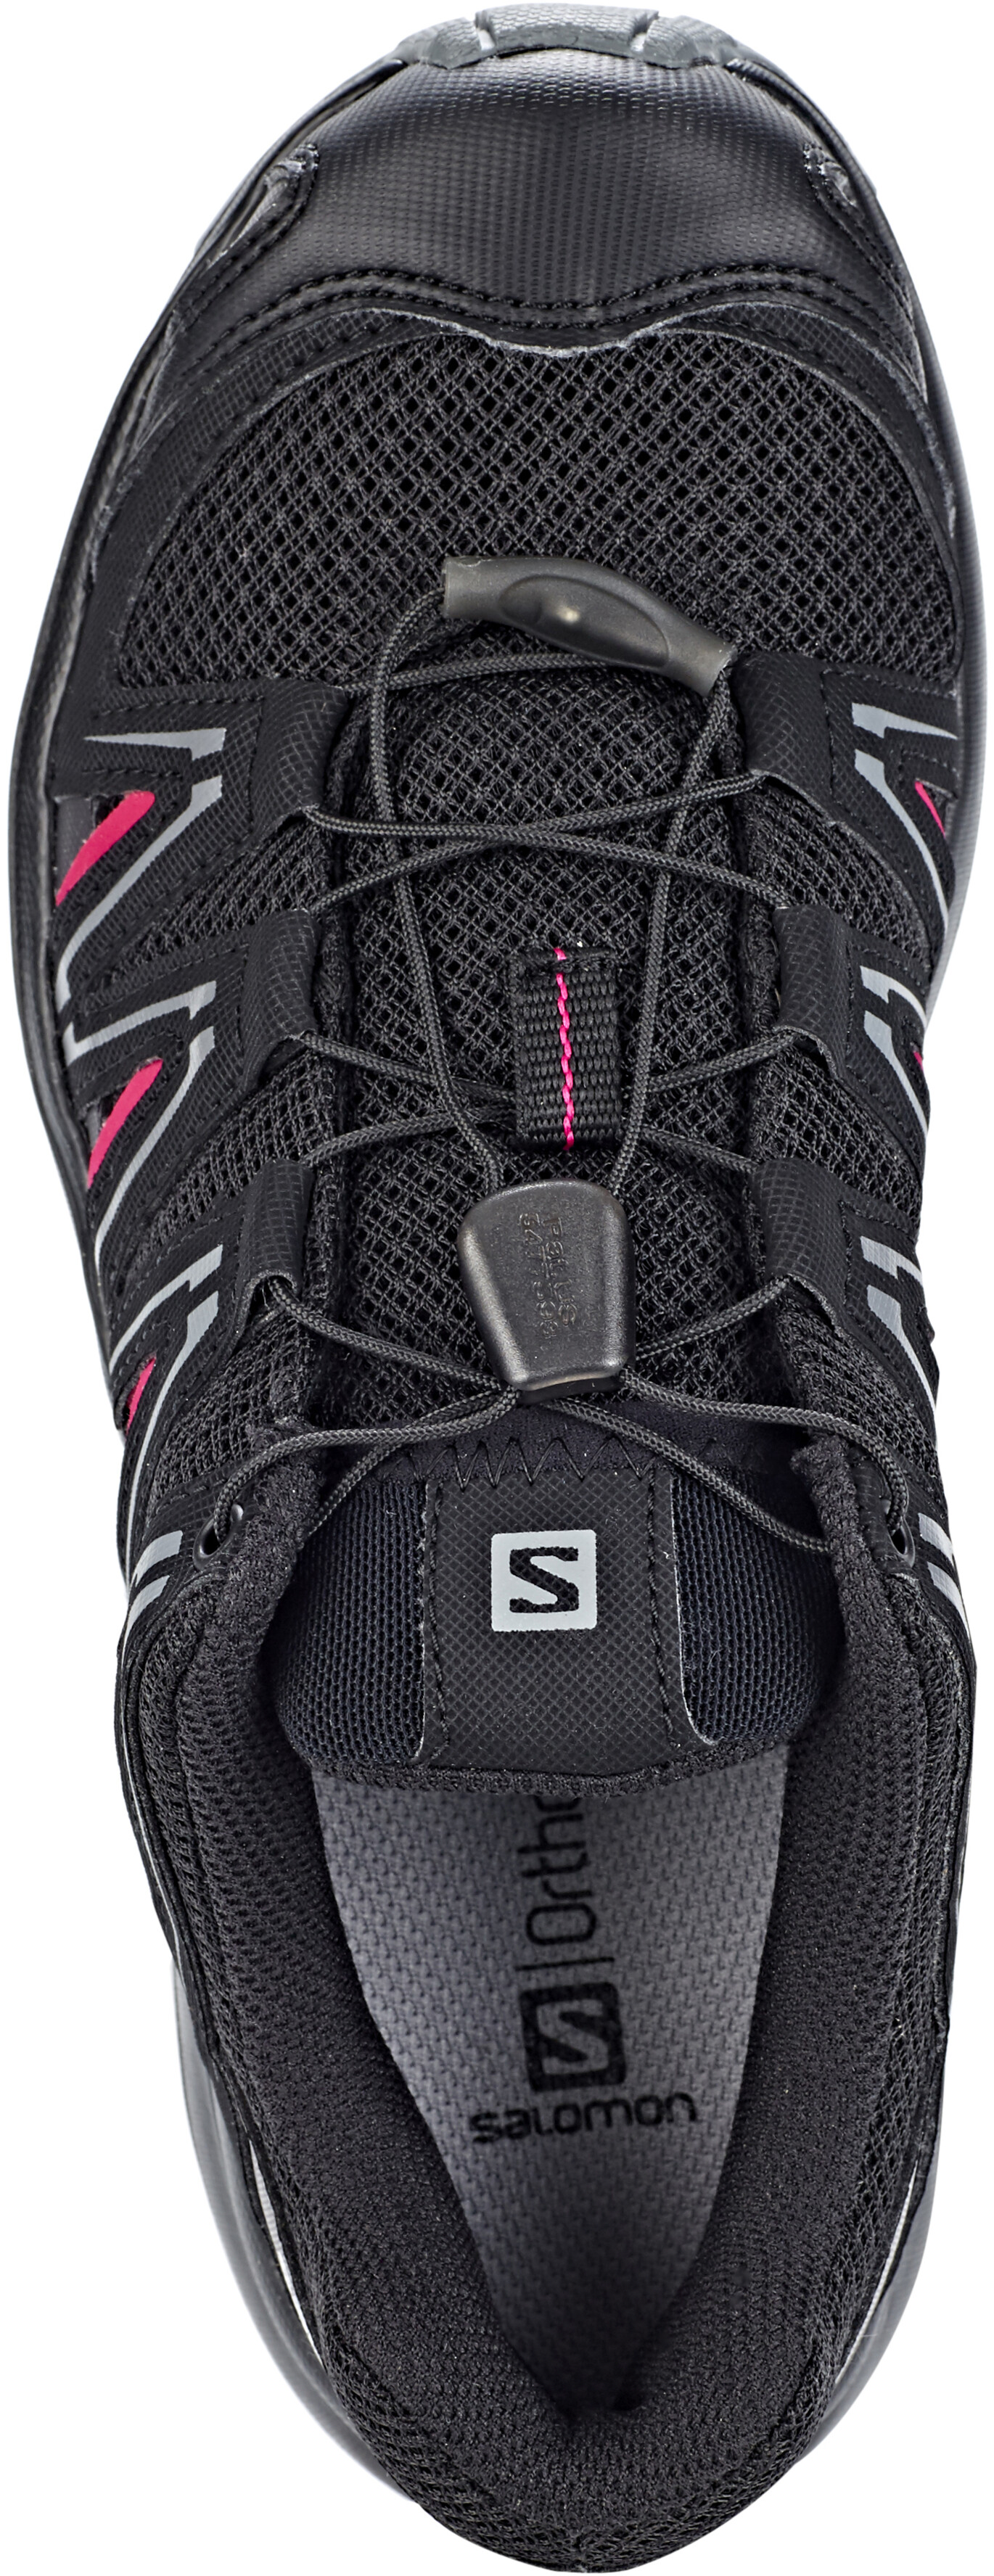 bf167c6f956f Salomon XA Kuban Shoes Women Black Black Cerise